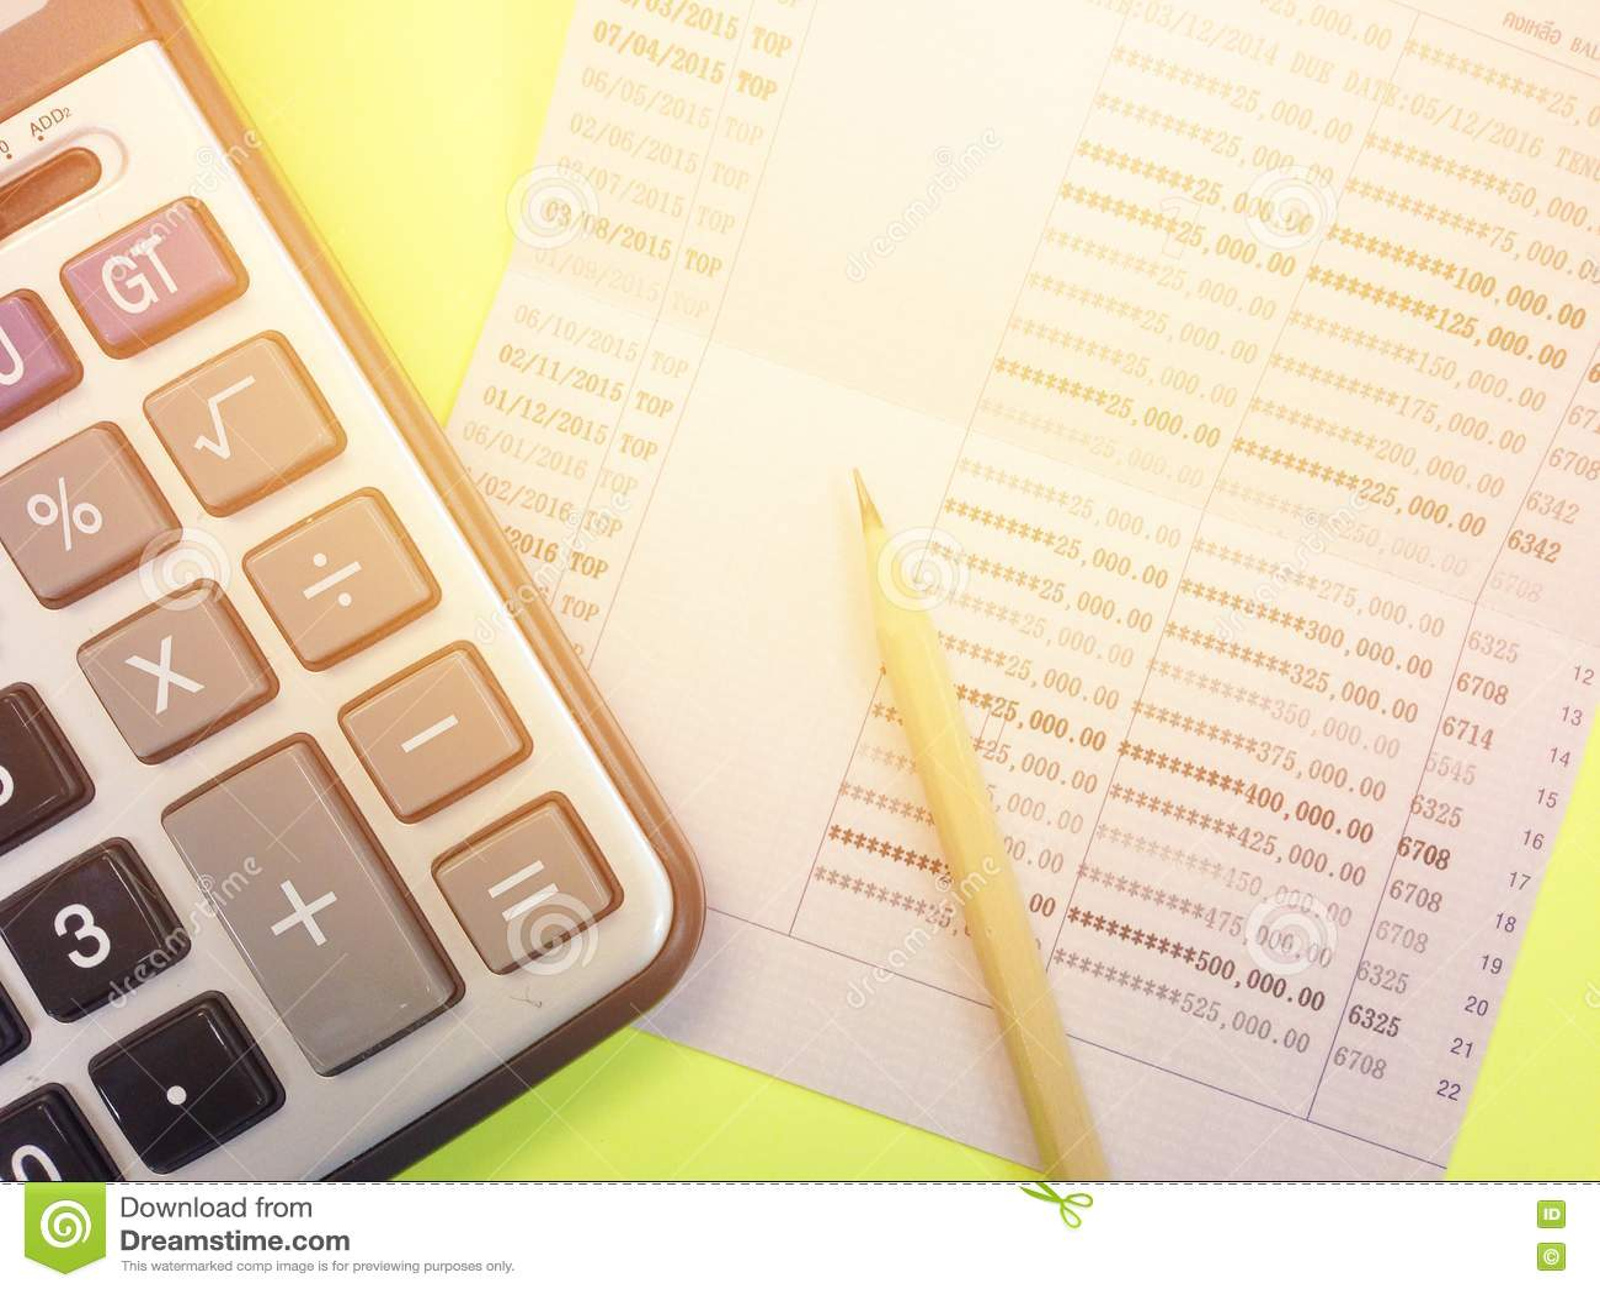 Calculator Pencil And Savings Account Passbook On Yellow – Savings Account Calculator